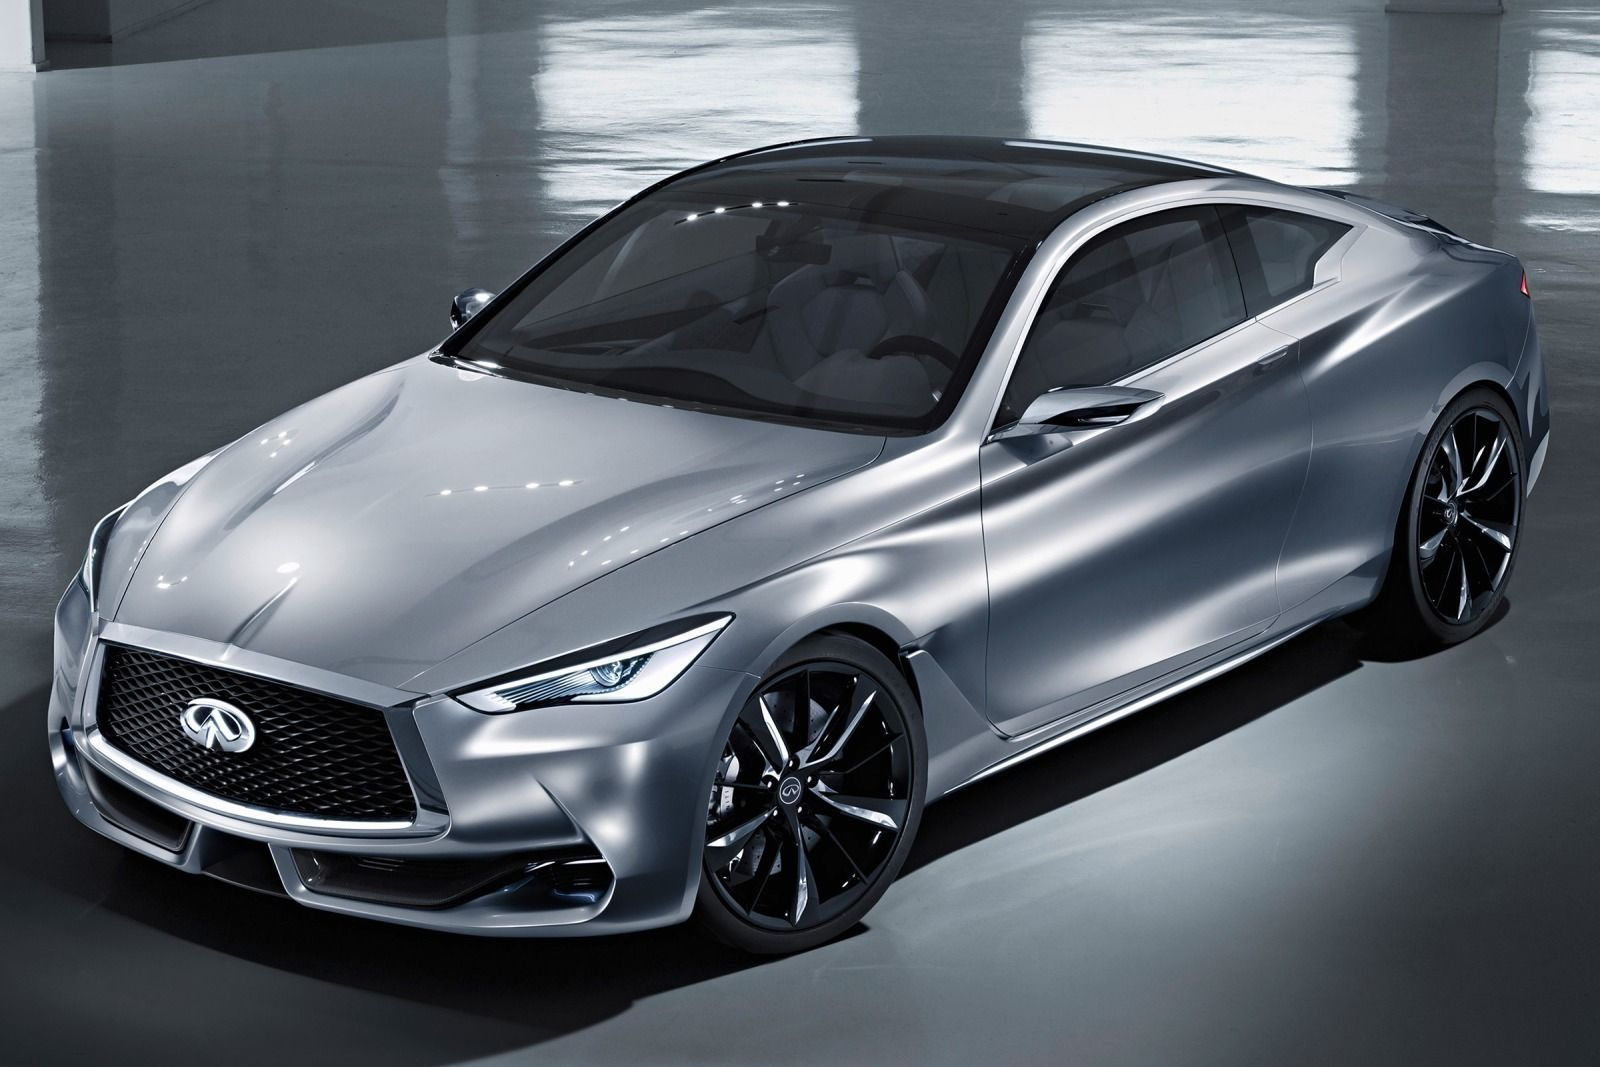 2020 Infiniti Q60 Exterior And Interior Review Cars Review 2019 Detroit Auto Show New Infiniti Concept Cars